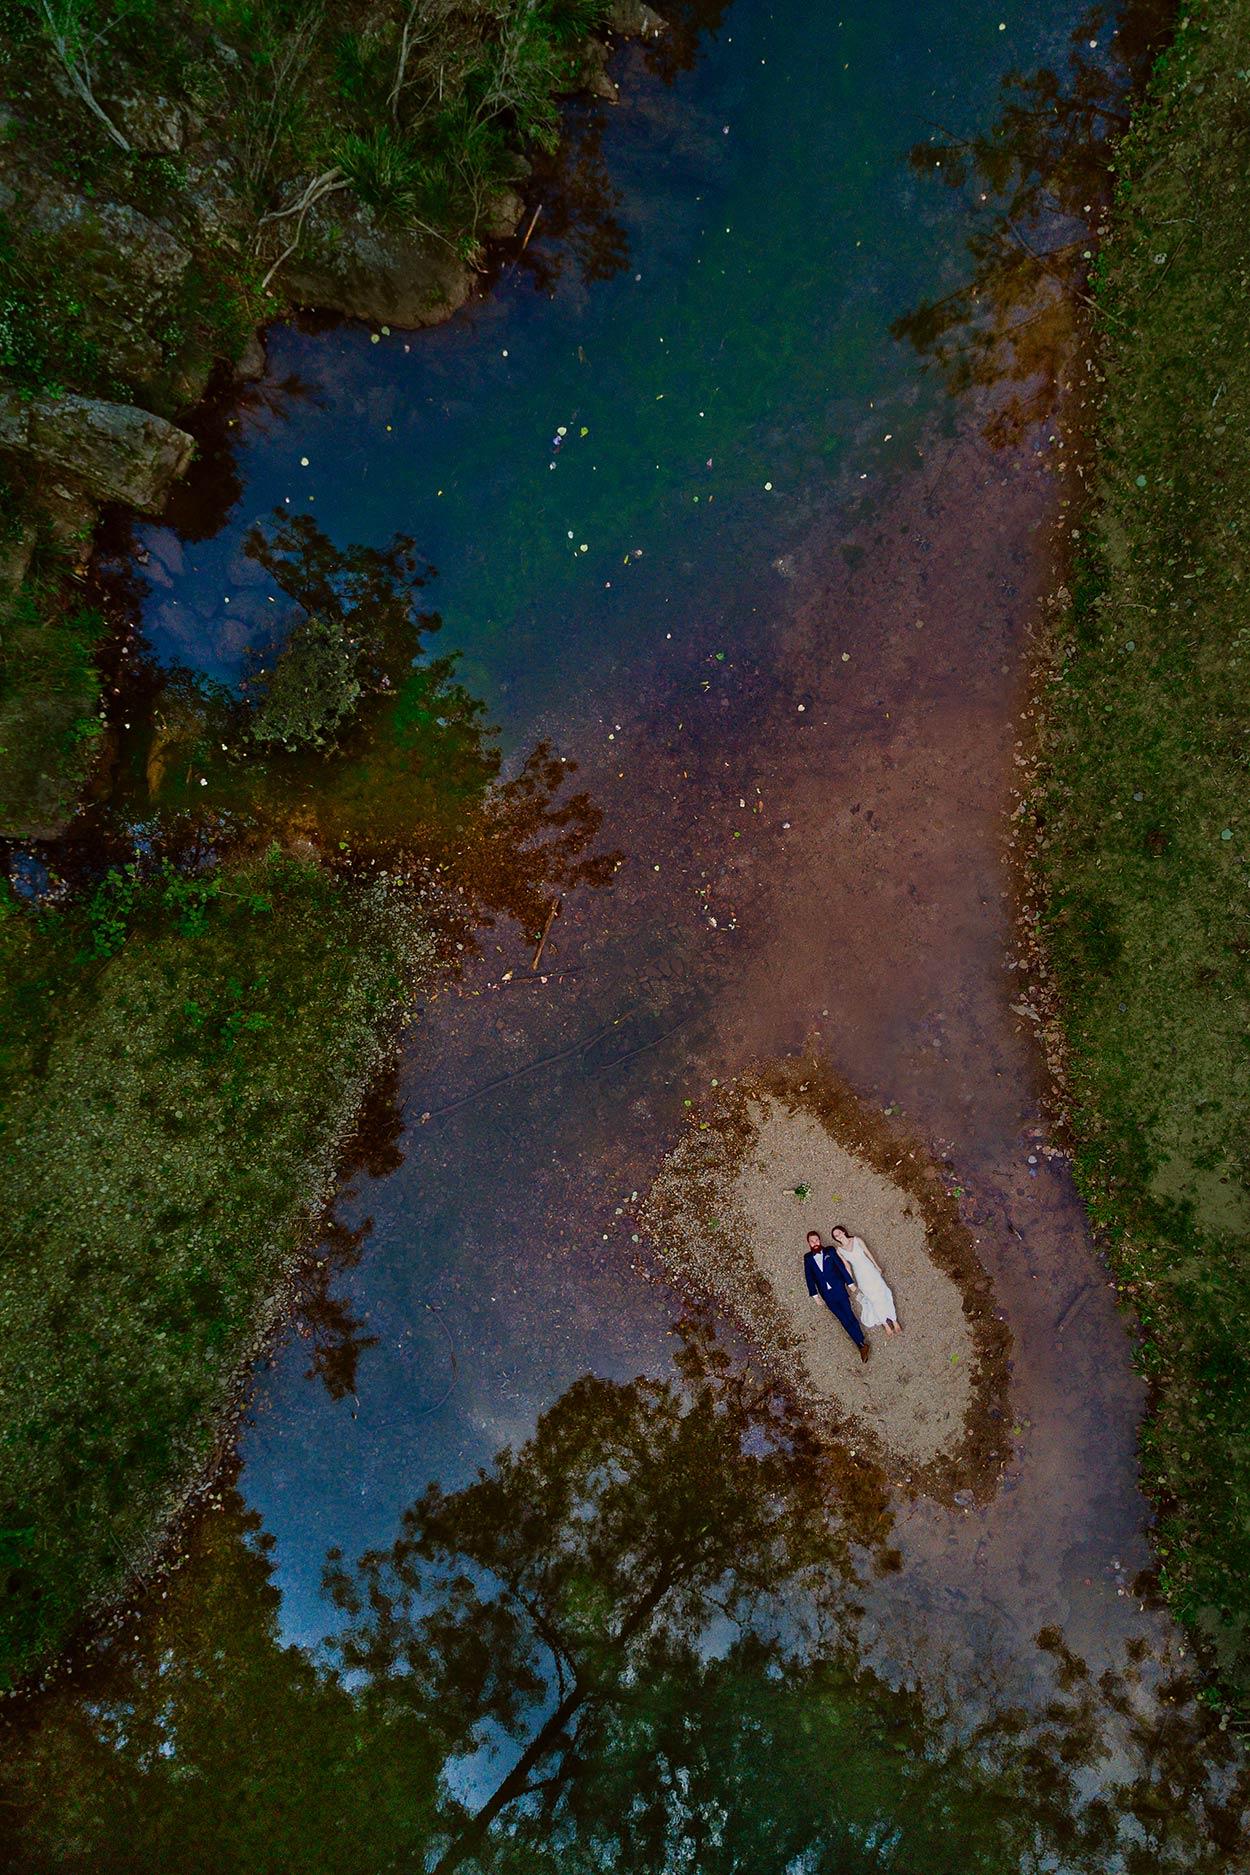 Noosa & Maleny Drone Destination Wedding Photographer - Top Sunshine Coast, Queensland, Australian